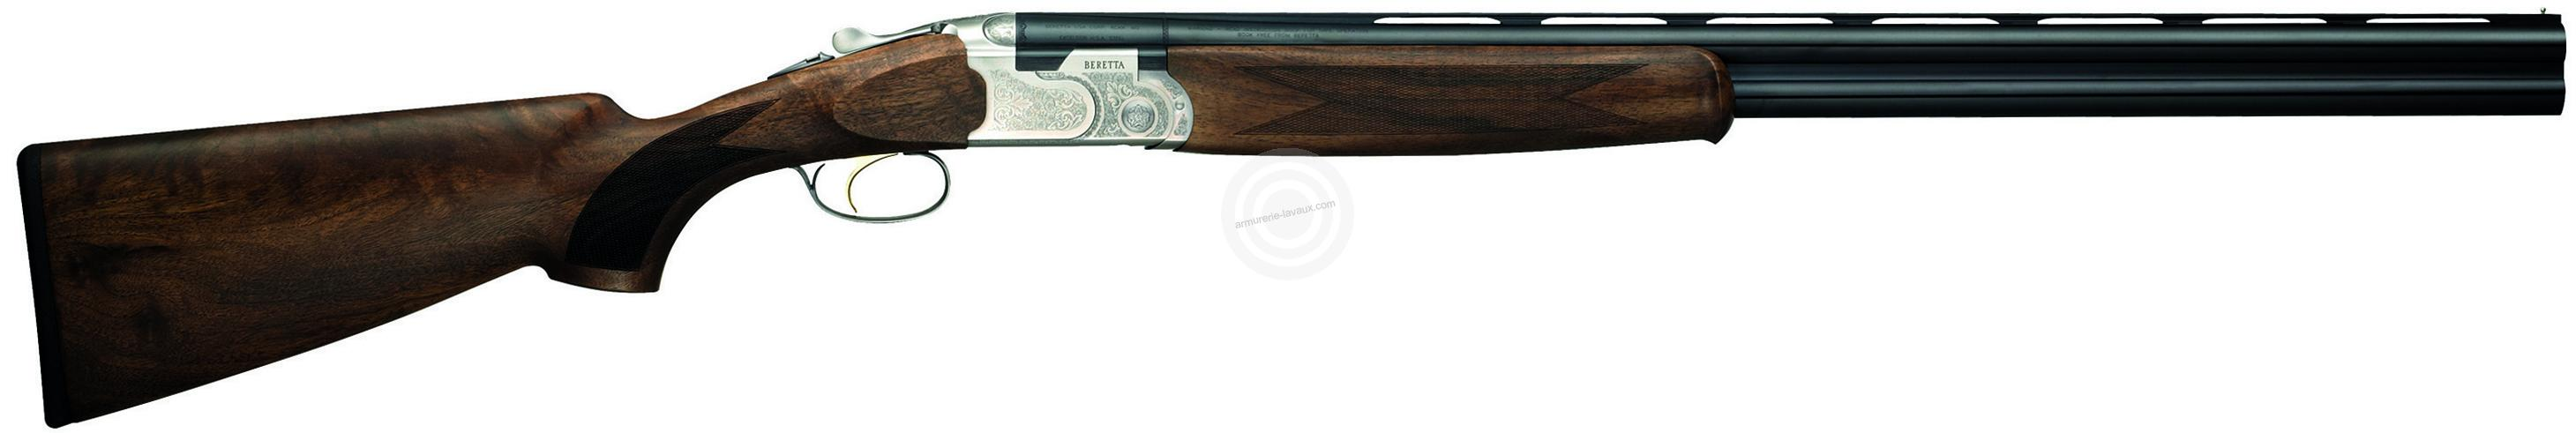 Fusil de chasse superposé BERETTA 686 SILVER PIGEON I cal.12/76 (66cm)